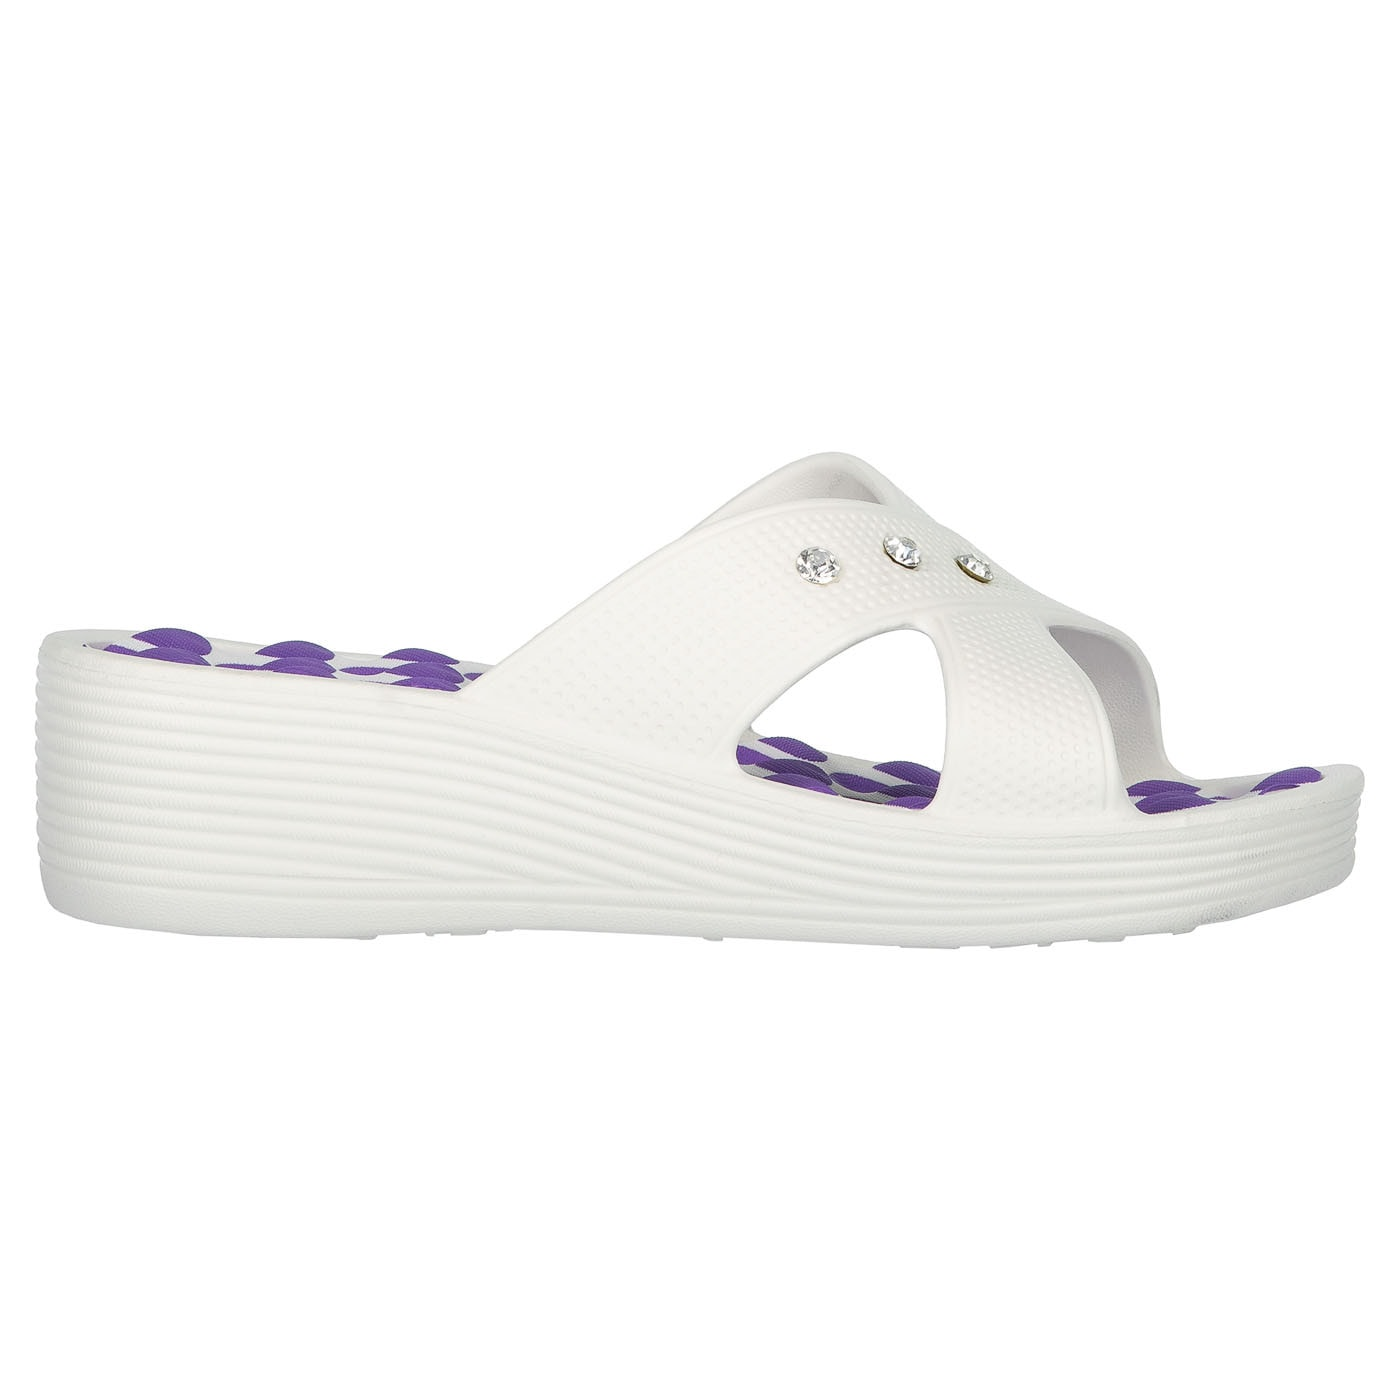 Women's slides FLAMEshoes B2017